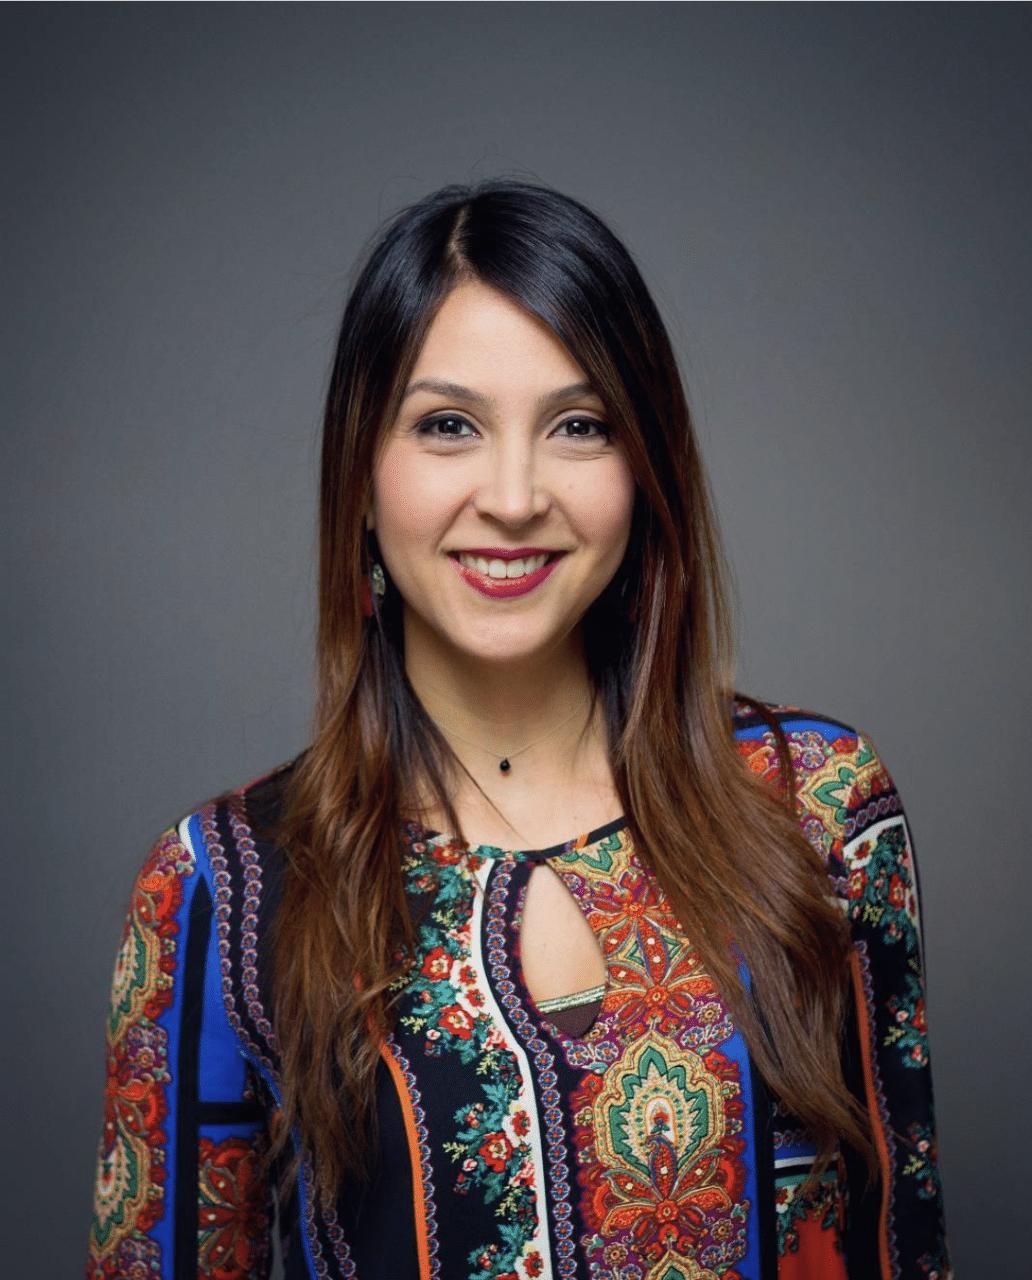 Juliana Correa, Marketing Director